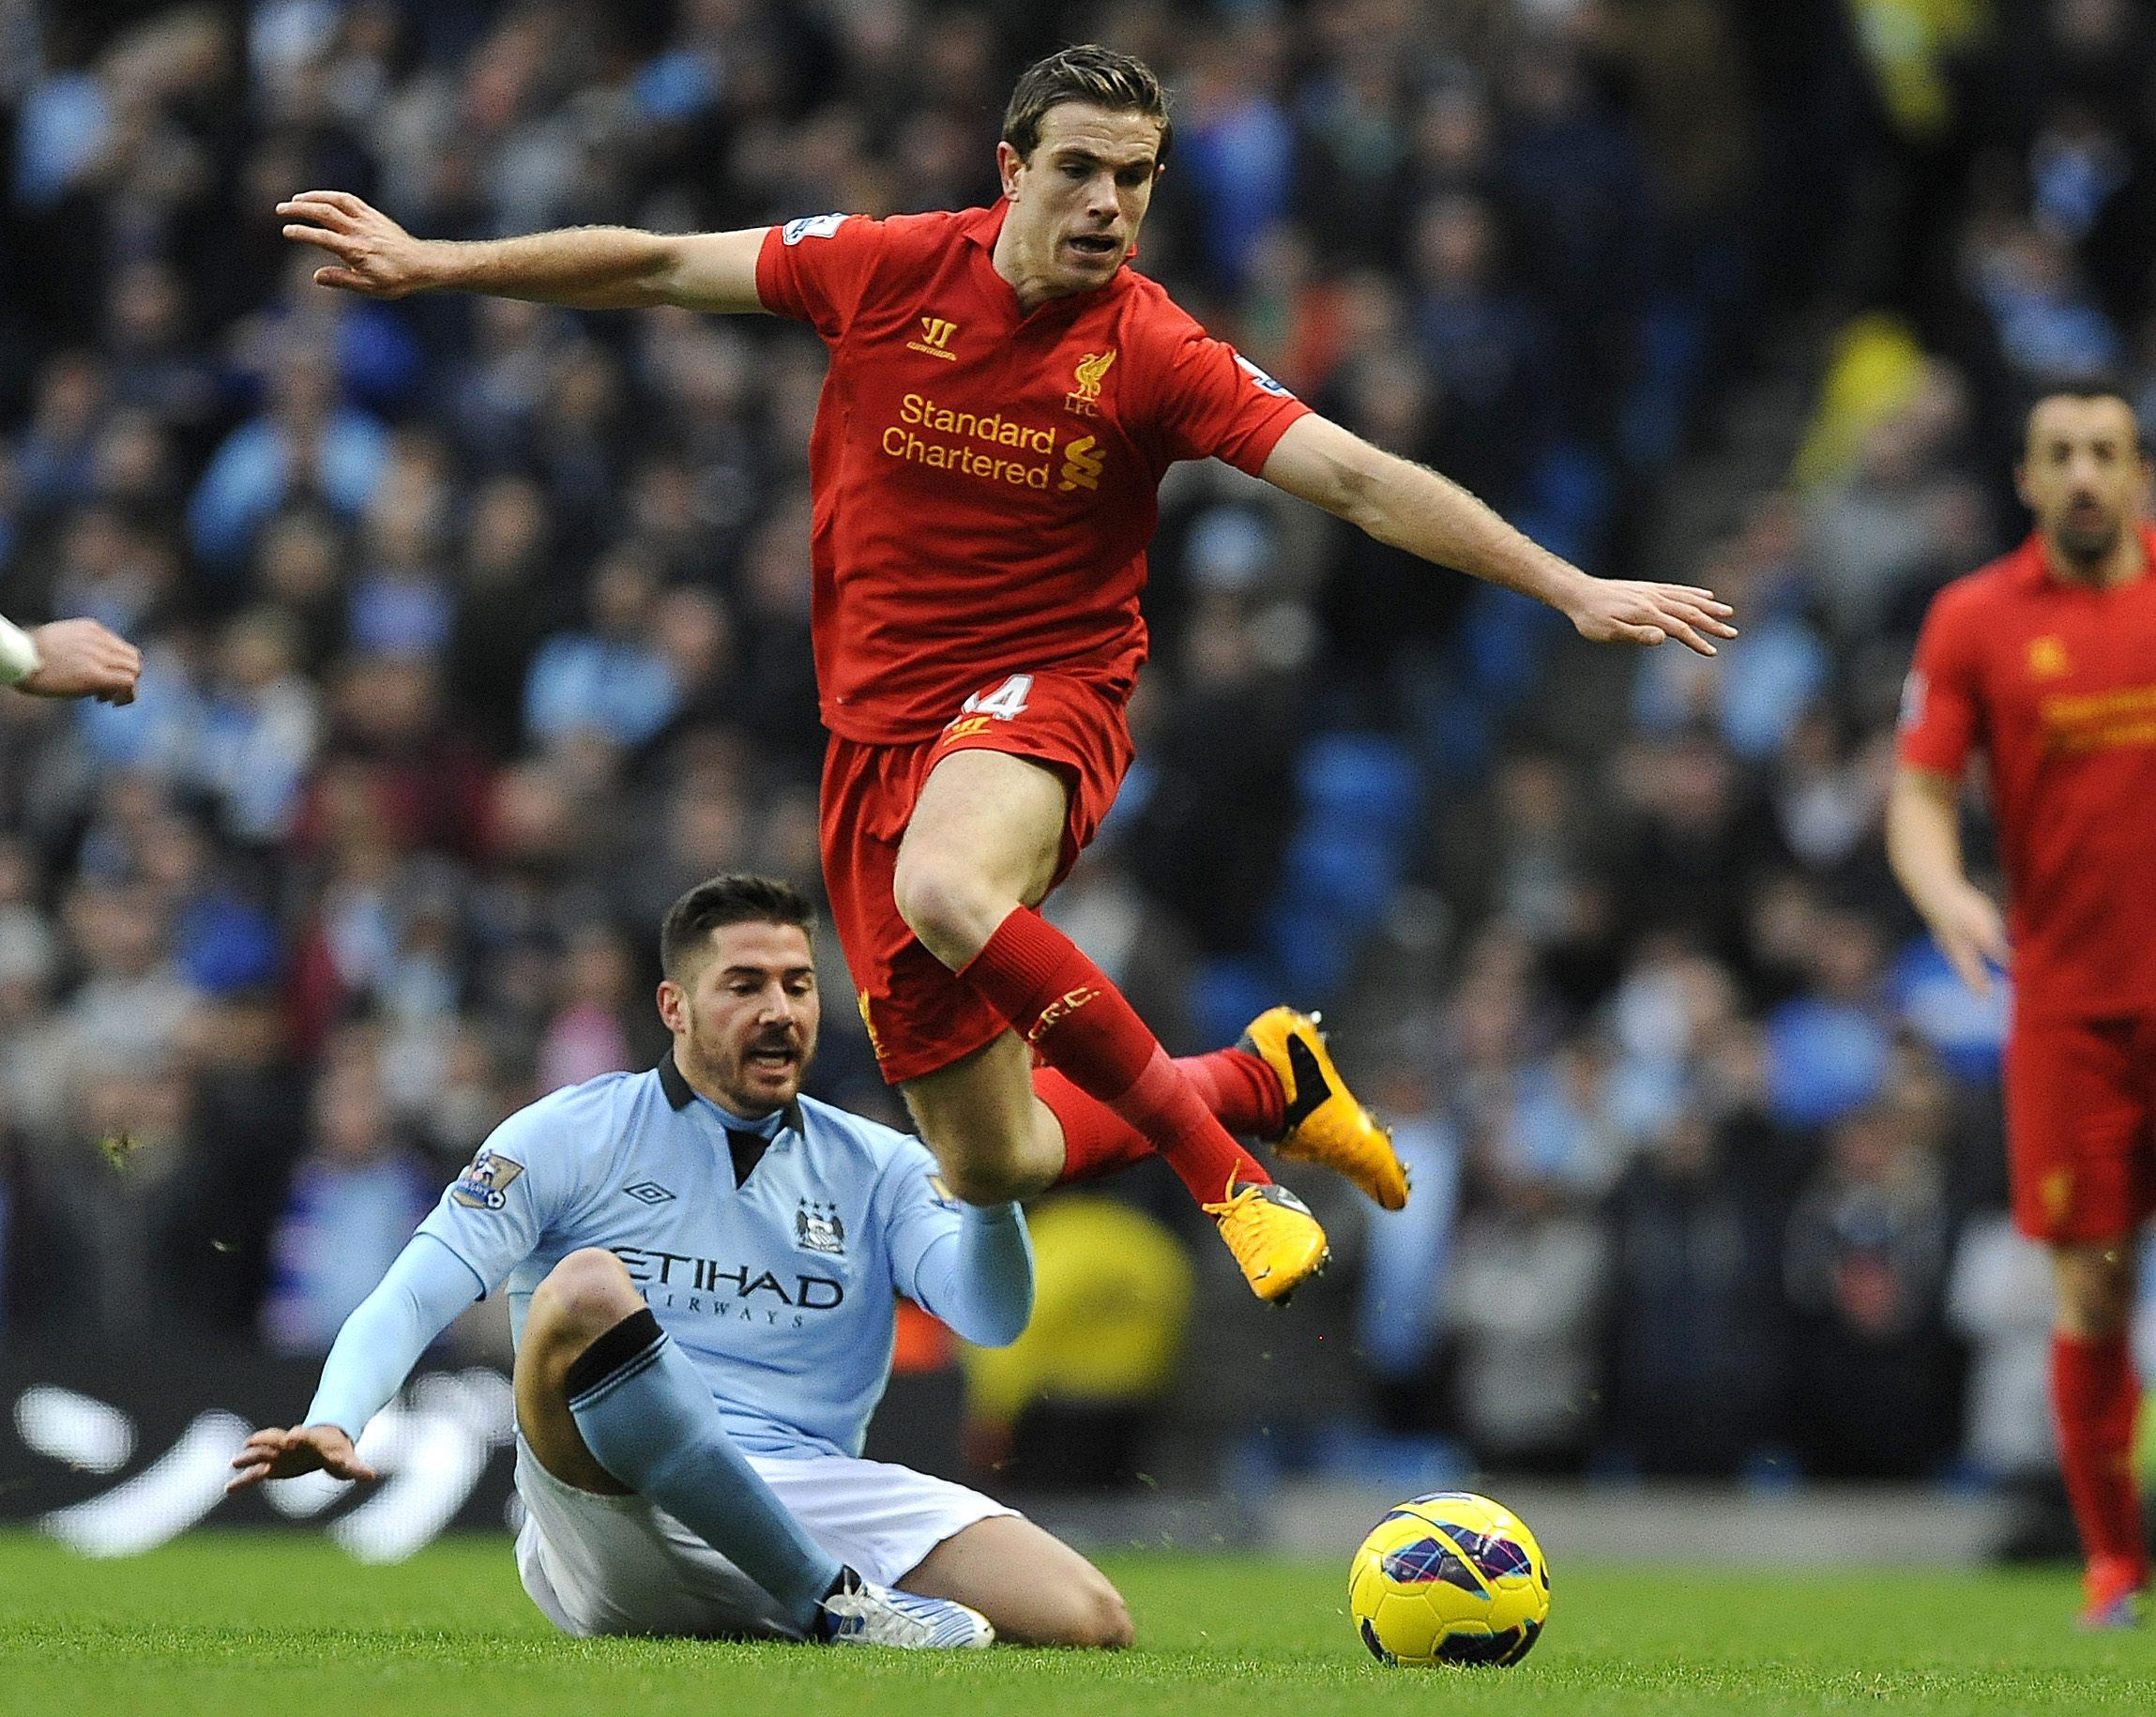 Liverpool can still reach Europe, insists defiant Jordan Henderson